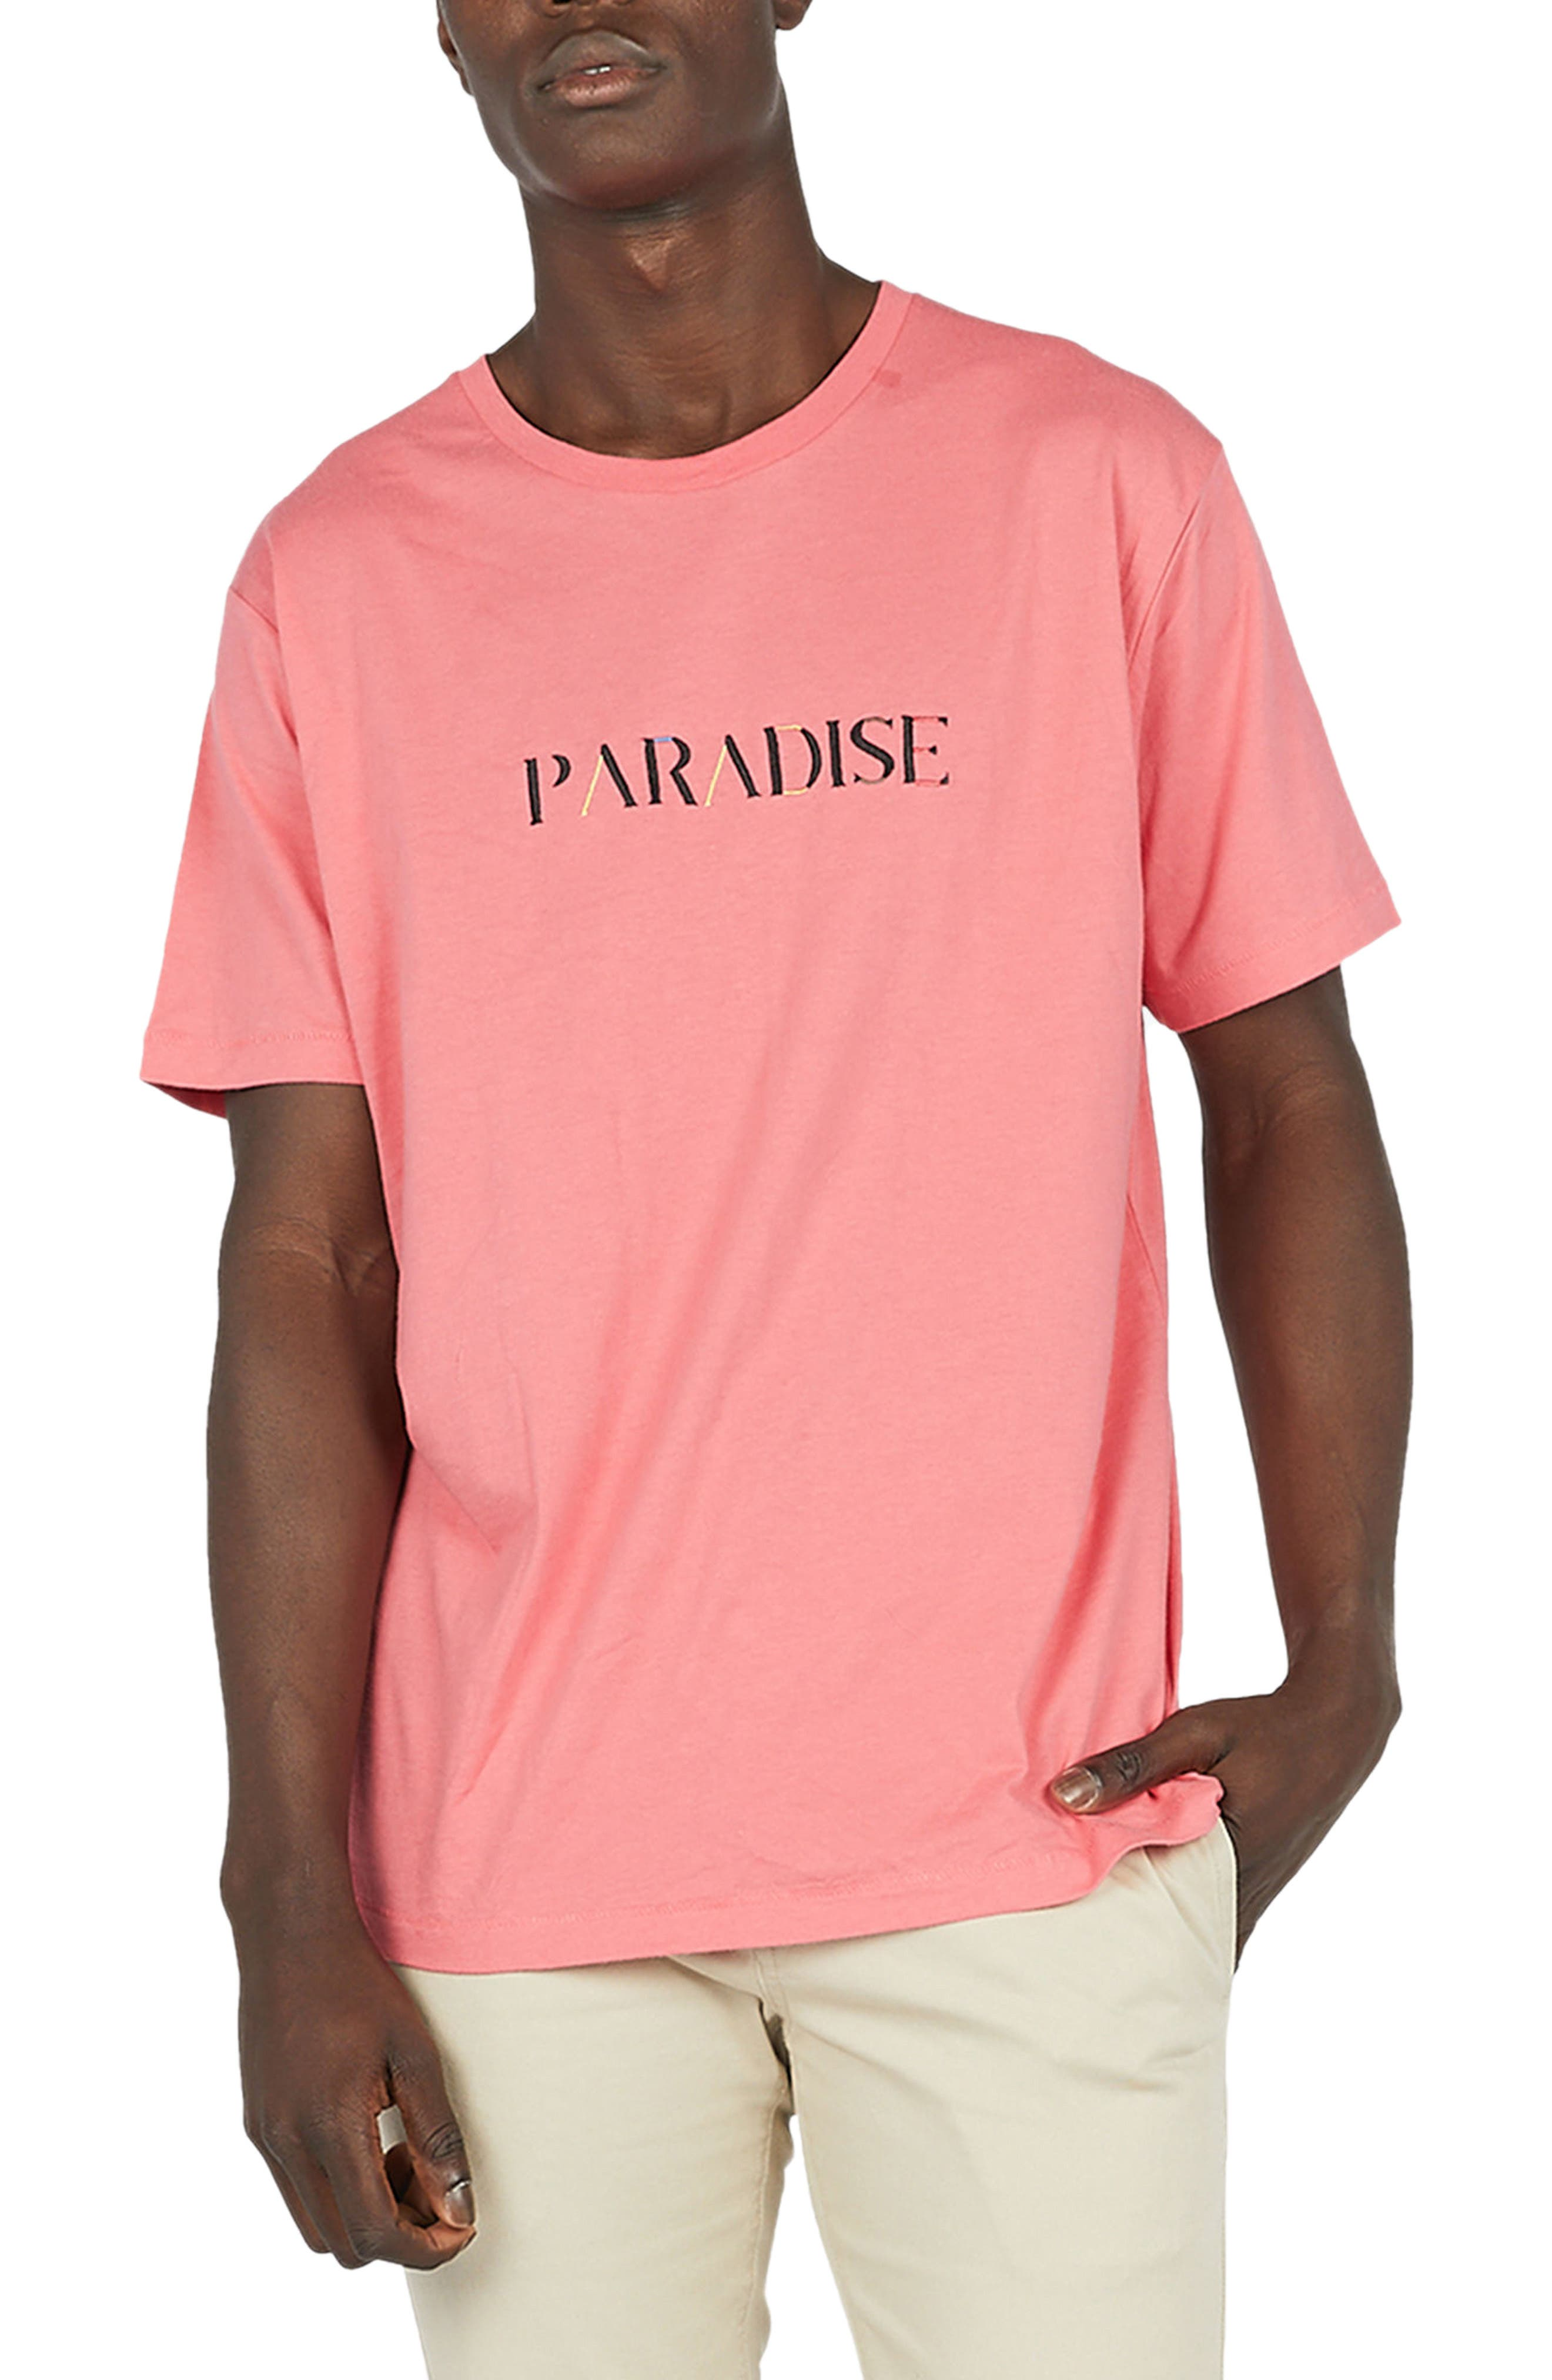 Paradise T-Shirt,                             Main thumbnail 1, color,                             950